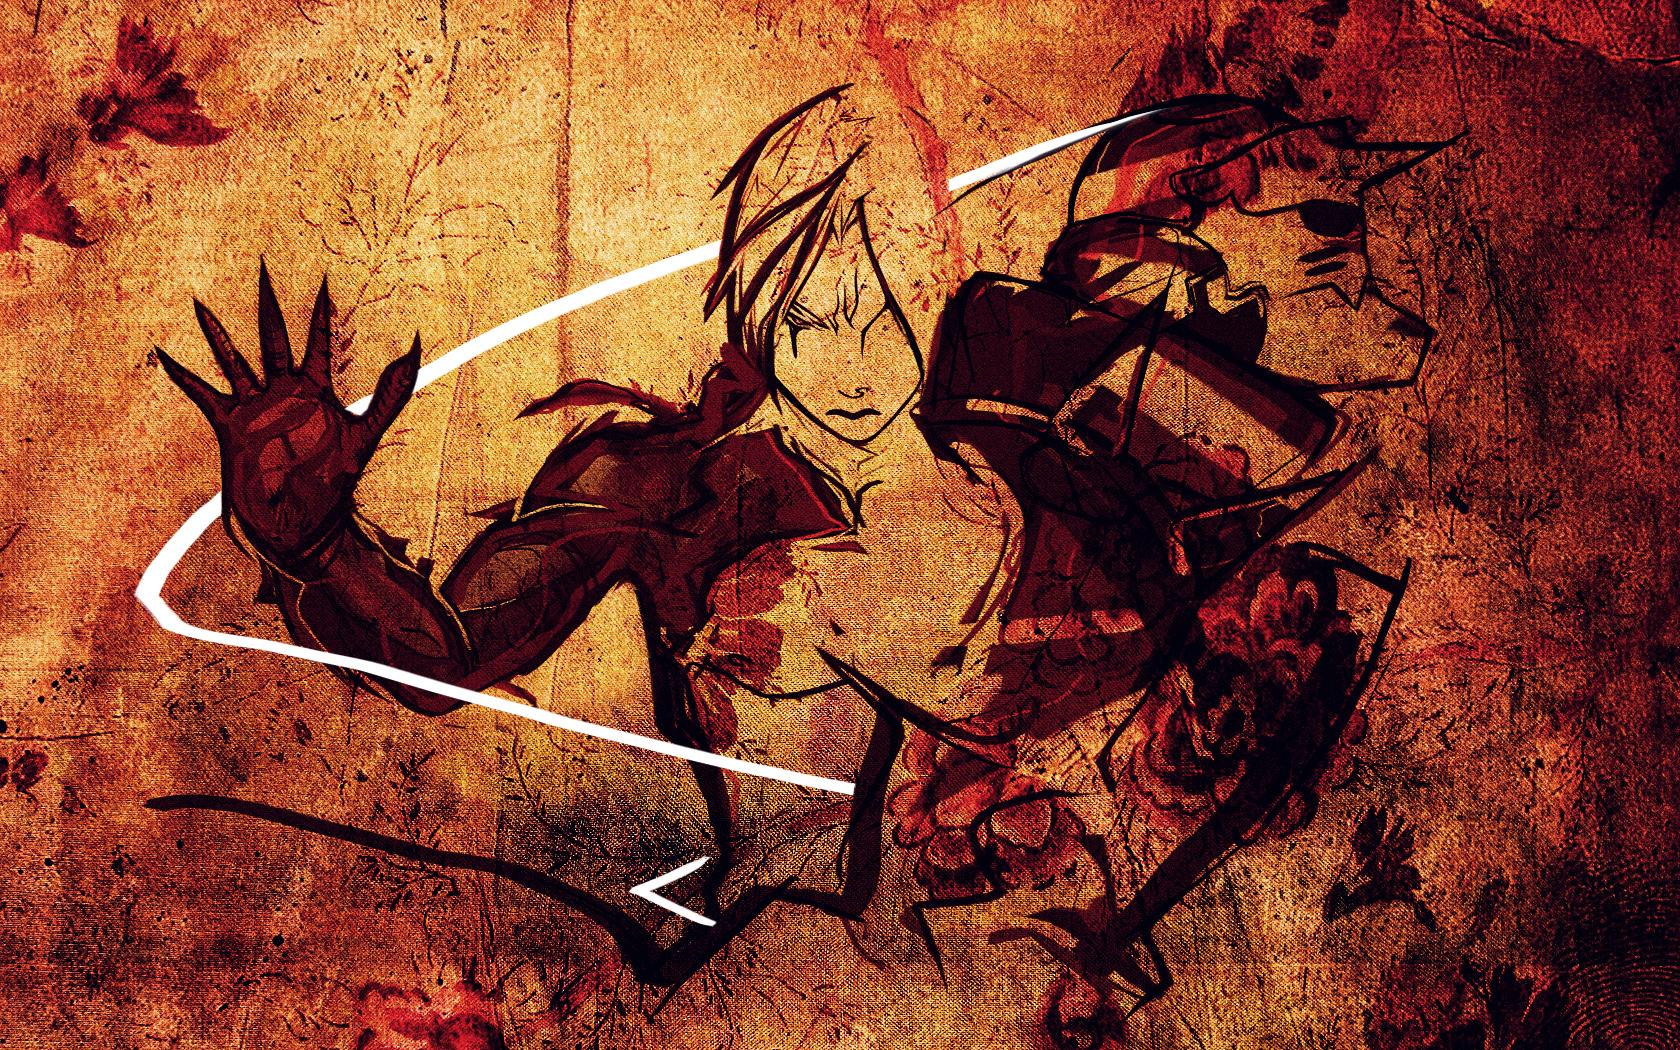 FullMetal Alchemist Wallpaper And Background Image